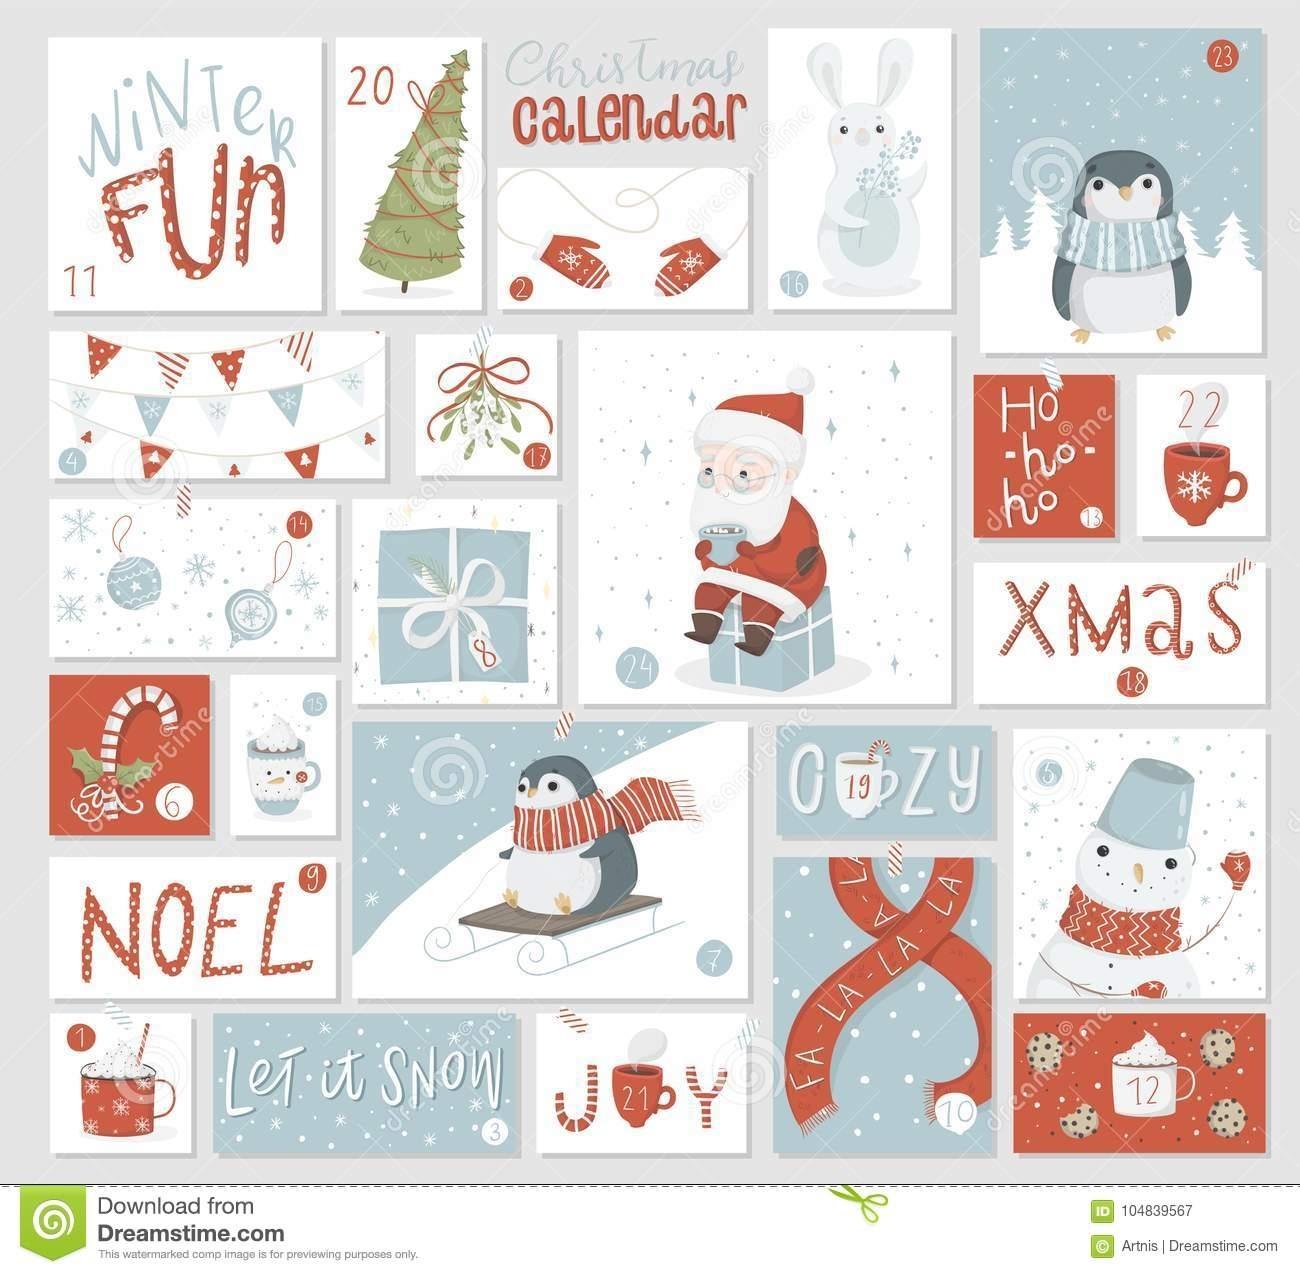 Christmas Advent Calendar, Cute Hand Drawn Style. Stock Vector Advent Calendar Countdown Or Count Up